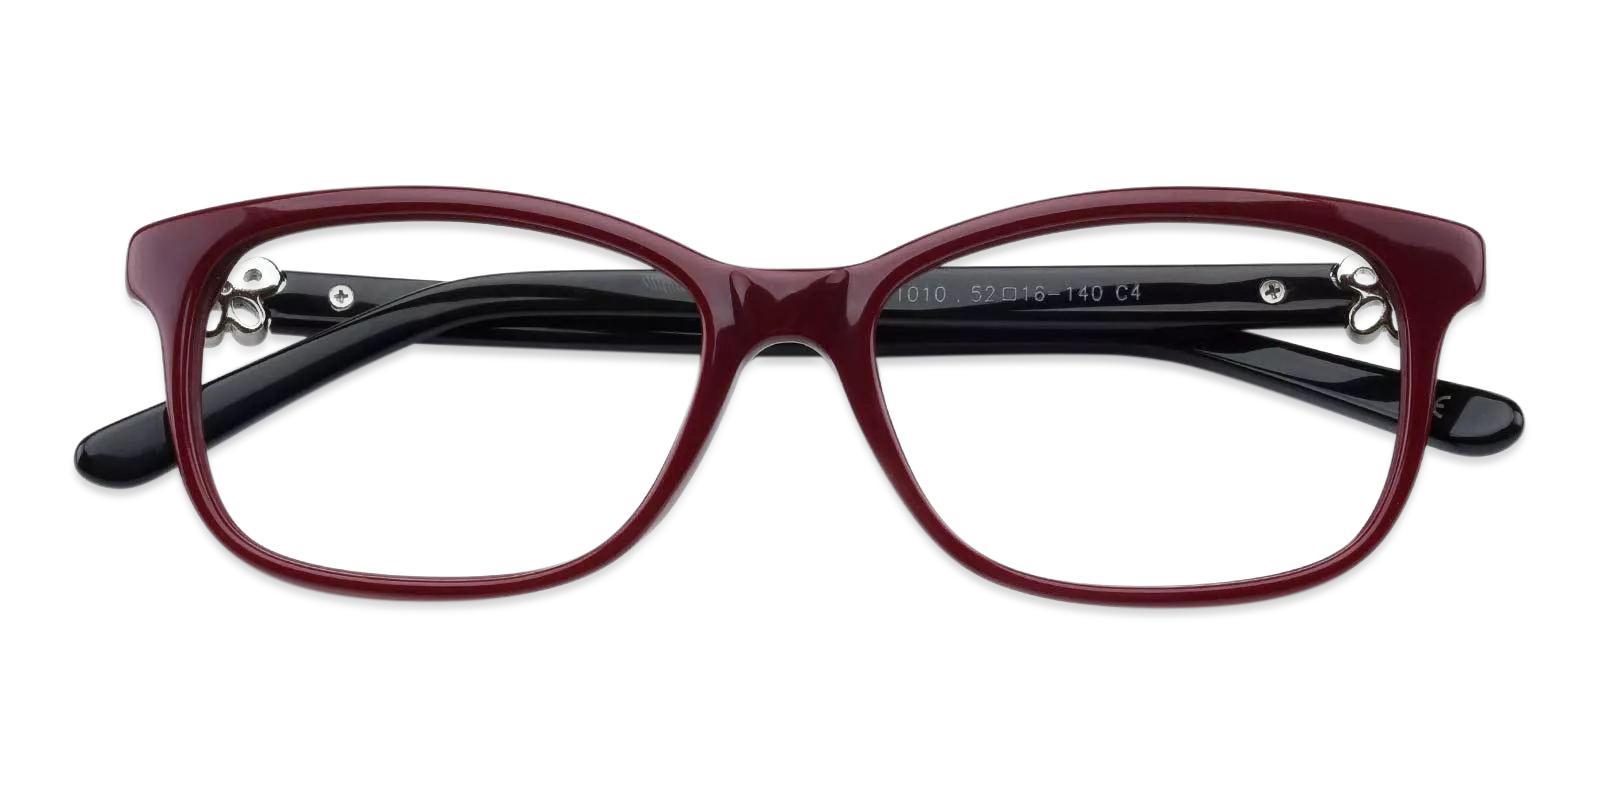 Paula Red Acetate Eyeglasses , Fashion , UniversalBridgeFit Frames from ABBE Glasses